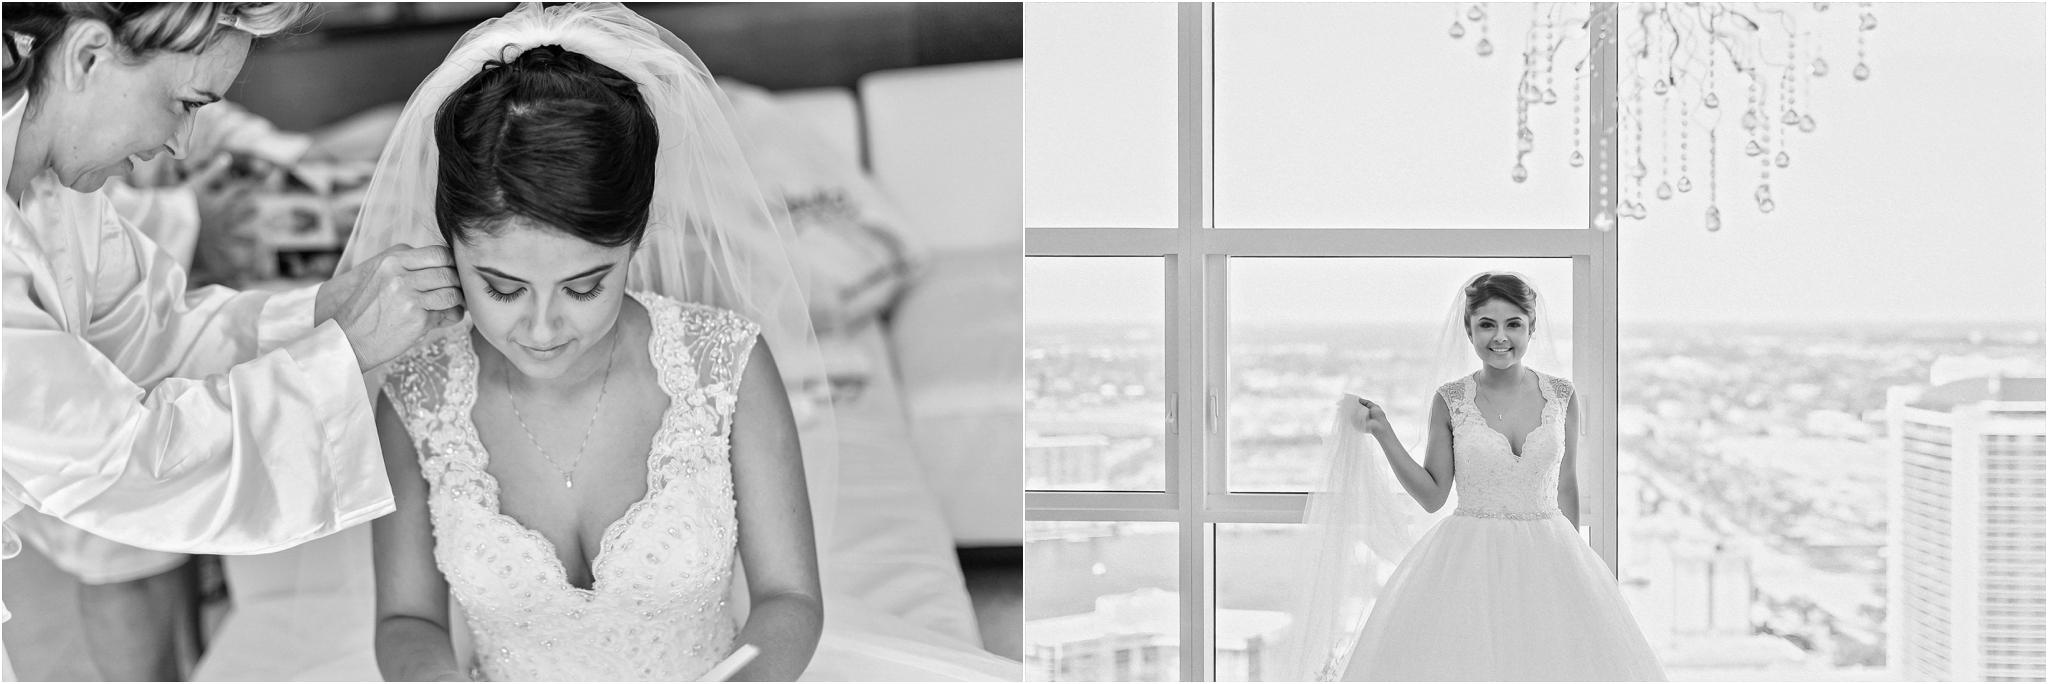 St-Francis-De-Sales-Wedding-Baro-Studios-Photography_0018.jpg